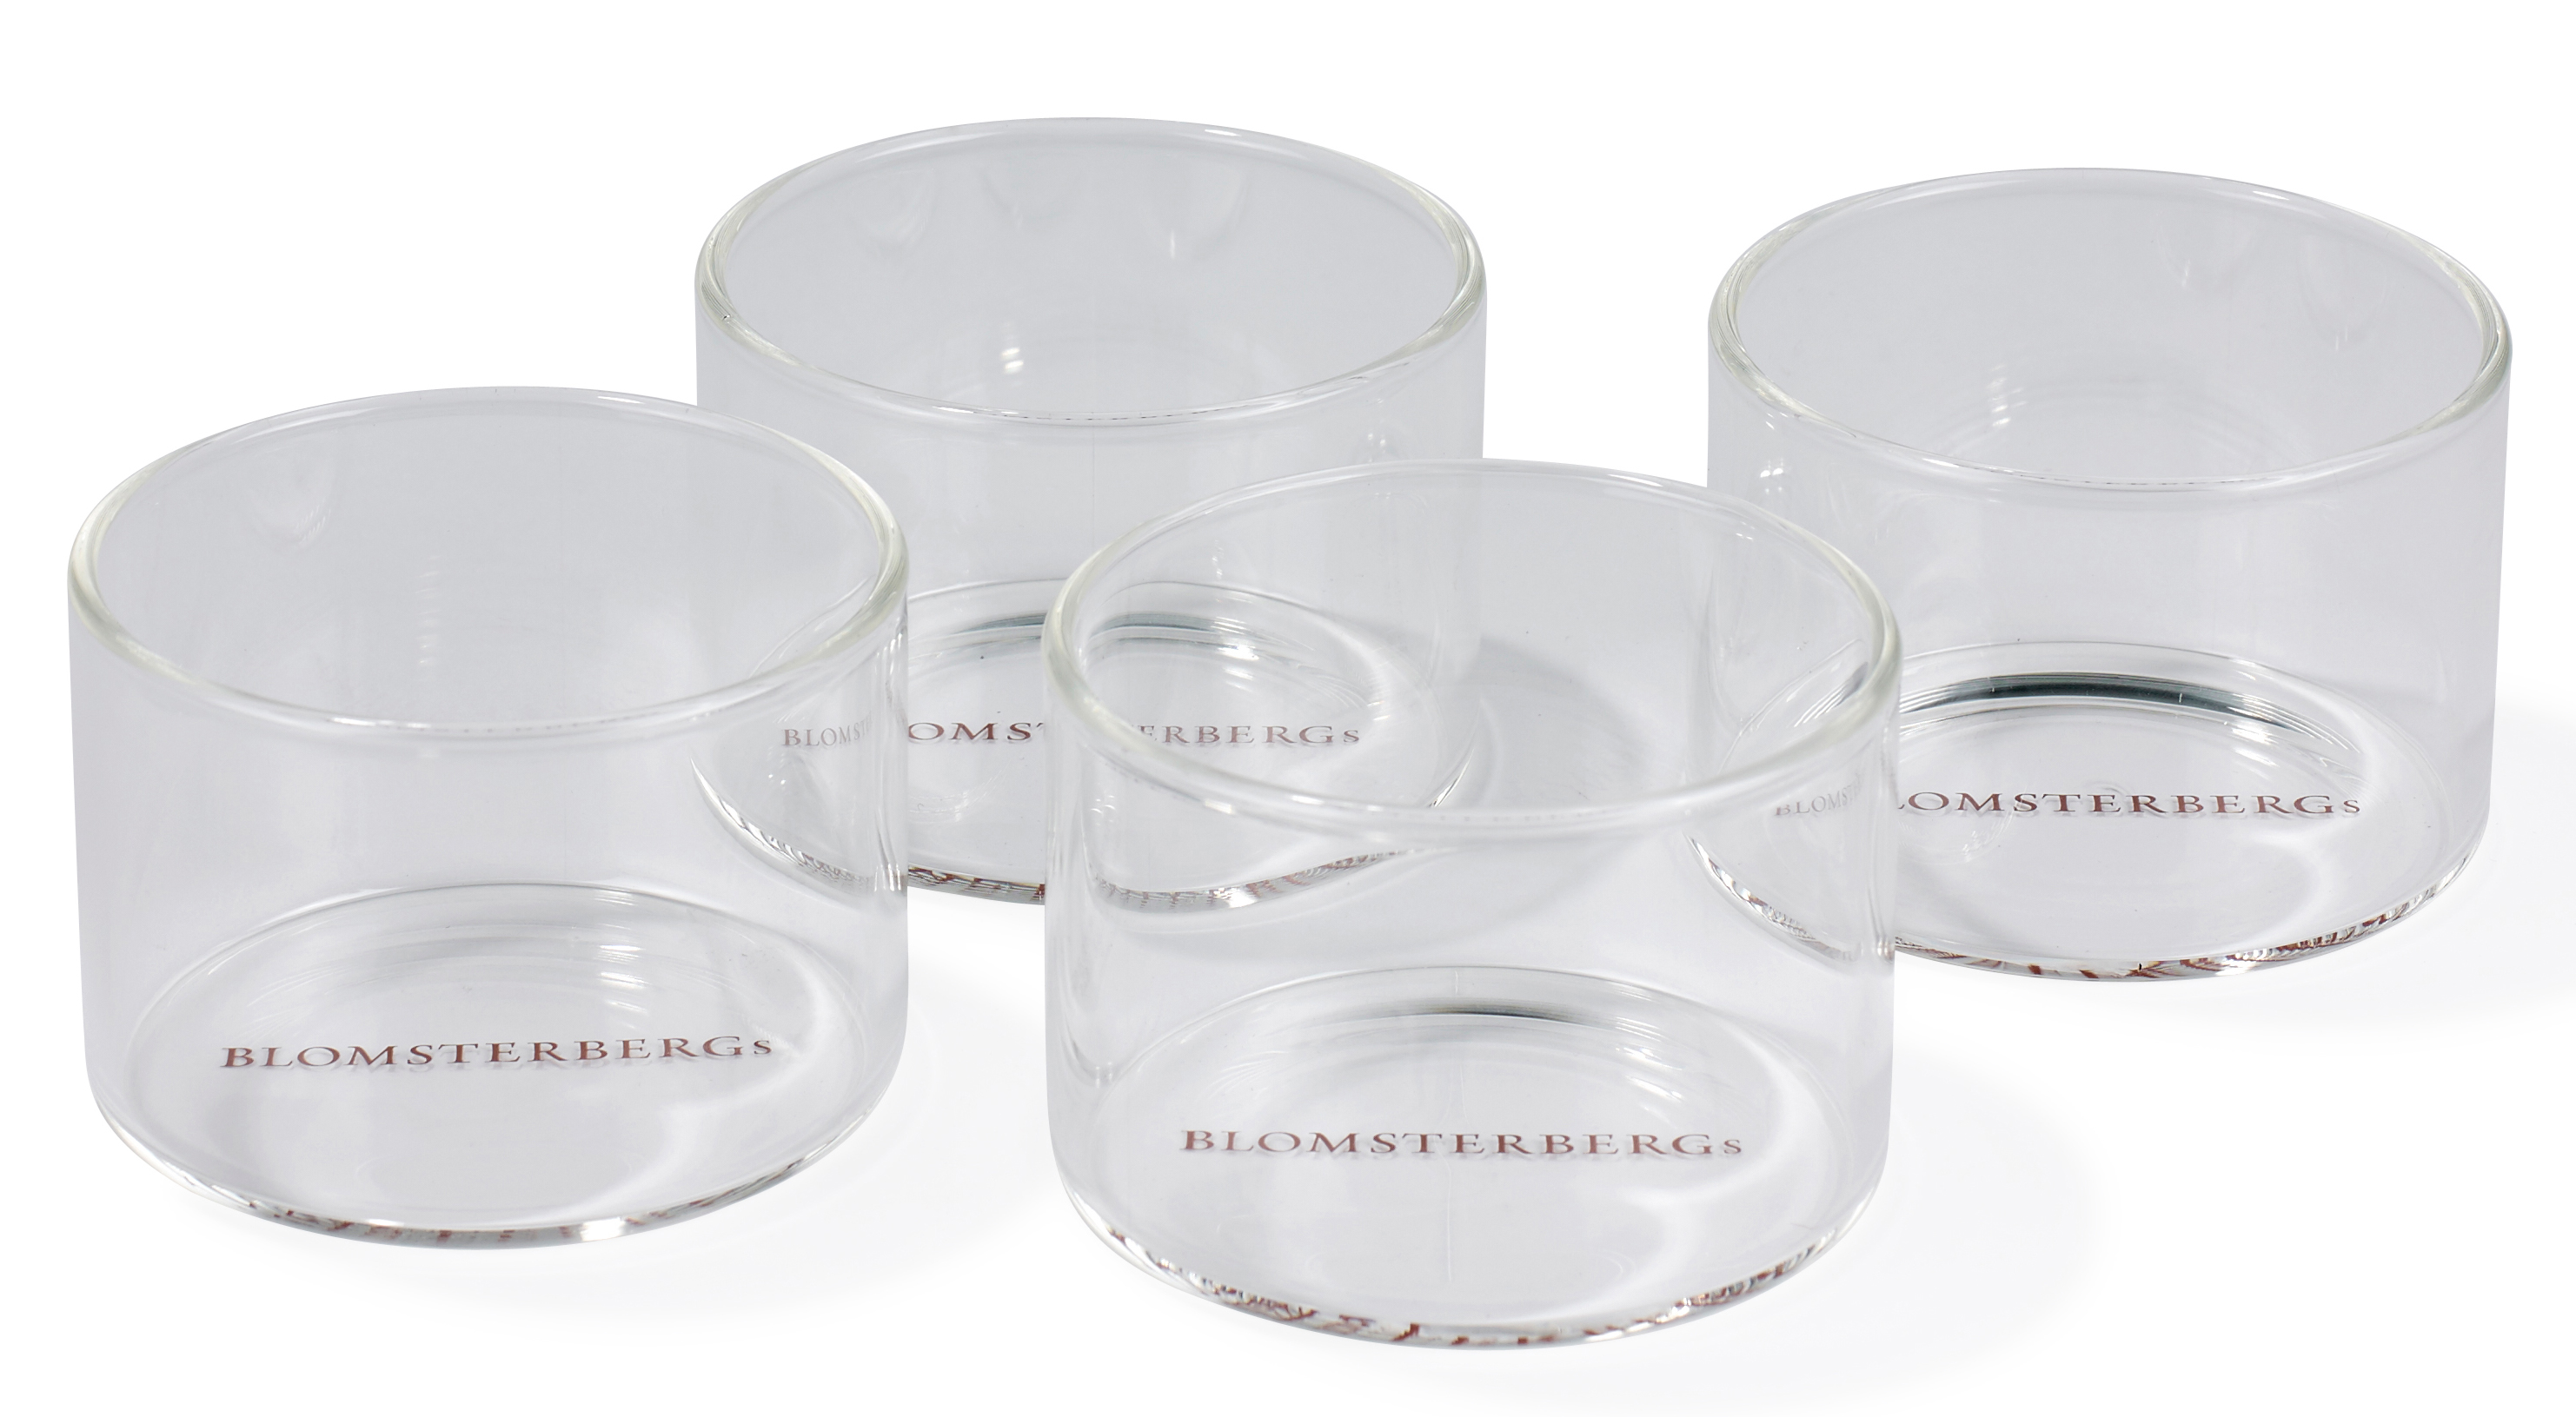 Blomsterberg Serveringsglas Medium 4 st